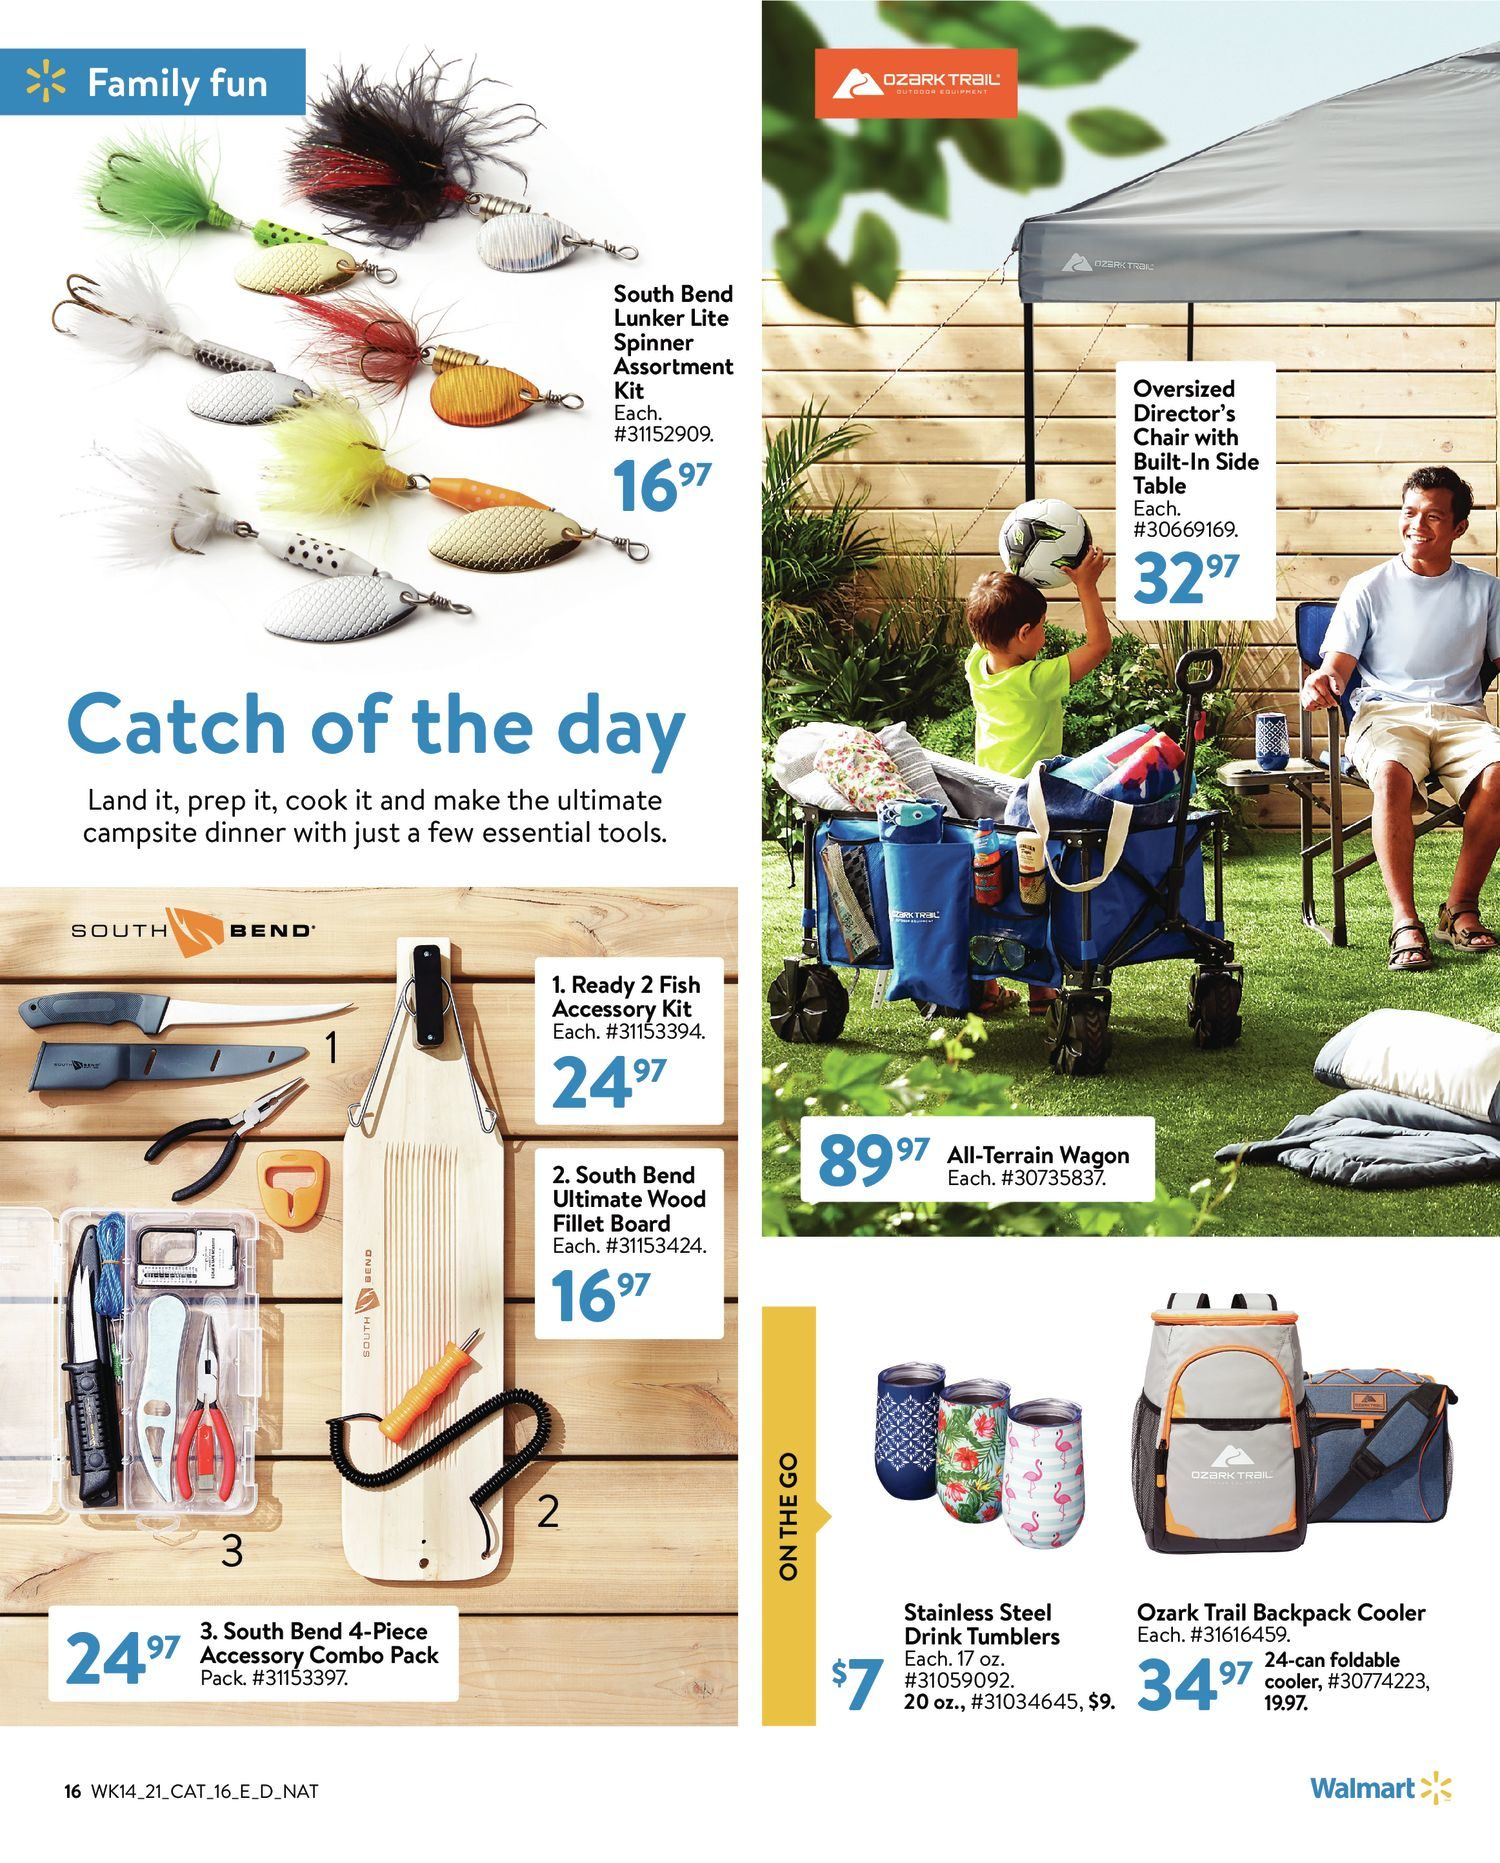 Walmart - Weekends Book - Page 16